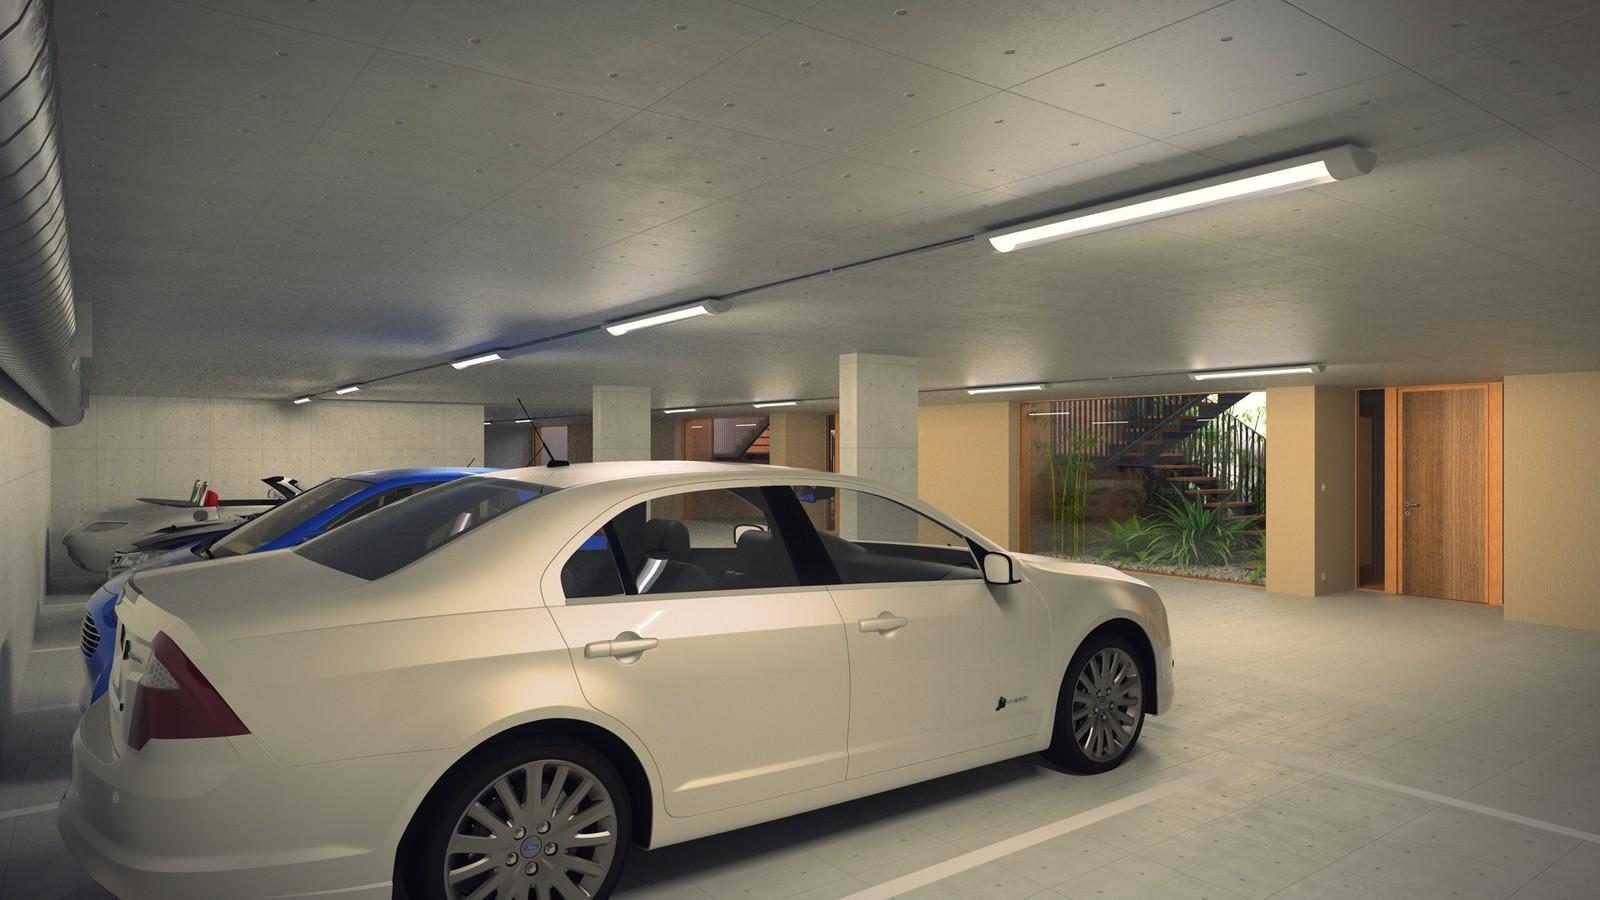 23 A1309-Villas Portier 3d STAIRCASE-GARAGE-Garage SE Corner 02 Post  KP webpage of project: http://www.kemppro.com/KP_3D_communication_3_Villas_Veyrier.html